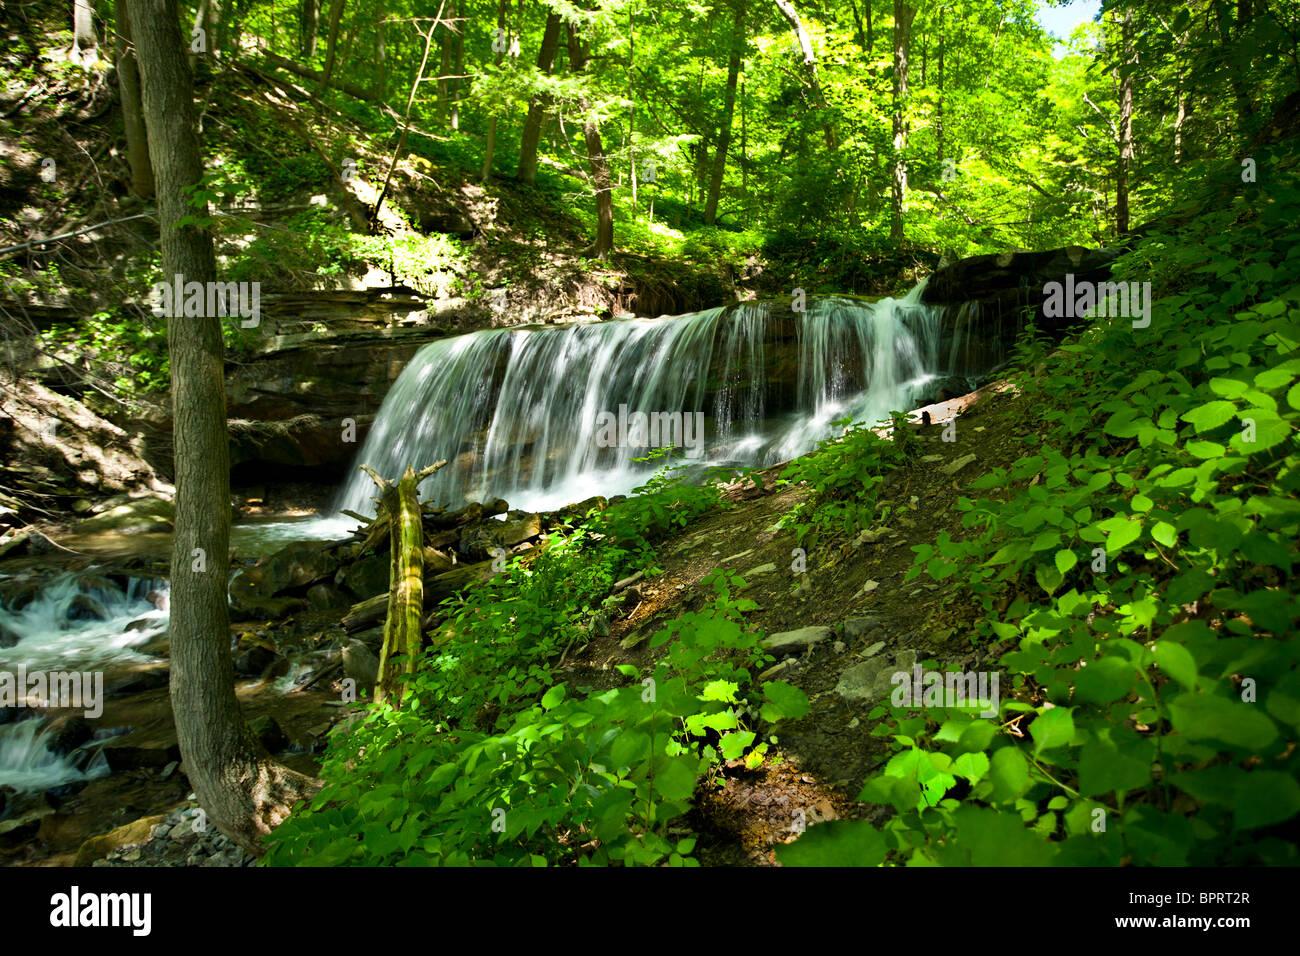 Waterfall Niagara Escarpment Ontario Canada - Stock Image